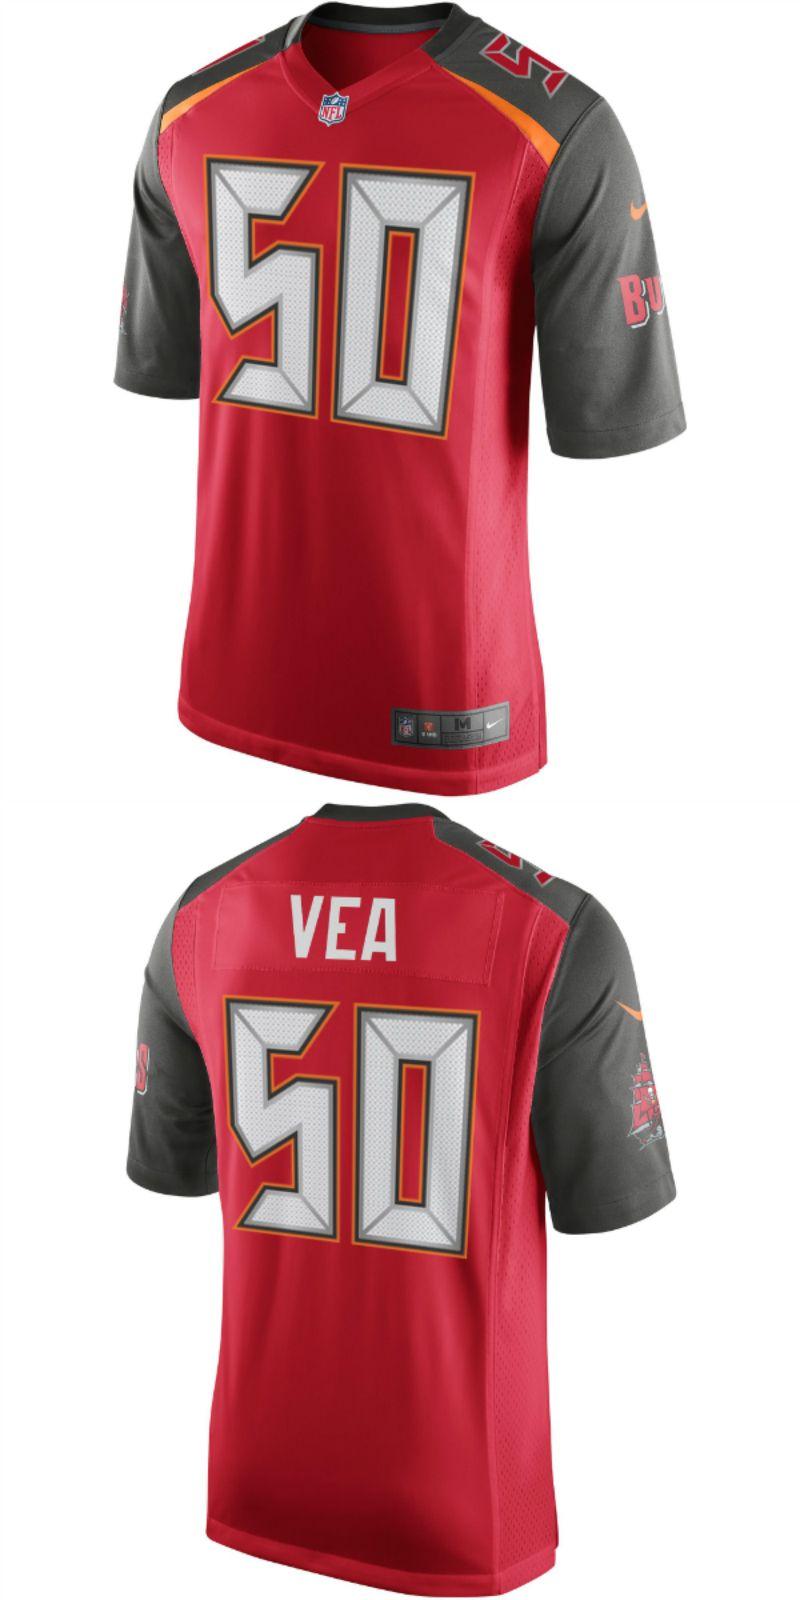 buy online 66d48 9ec26 UP TO 70% OFF. Vita Vea Tampa Bay Buccaneers Nike 2018 NFL ...